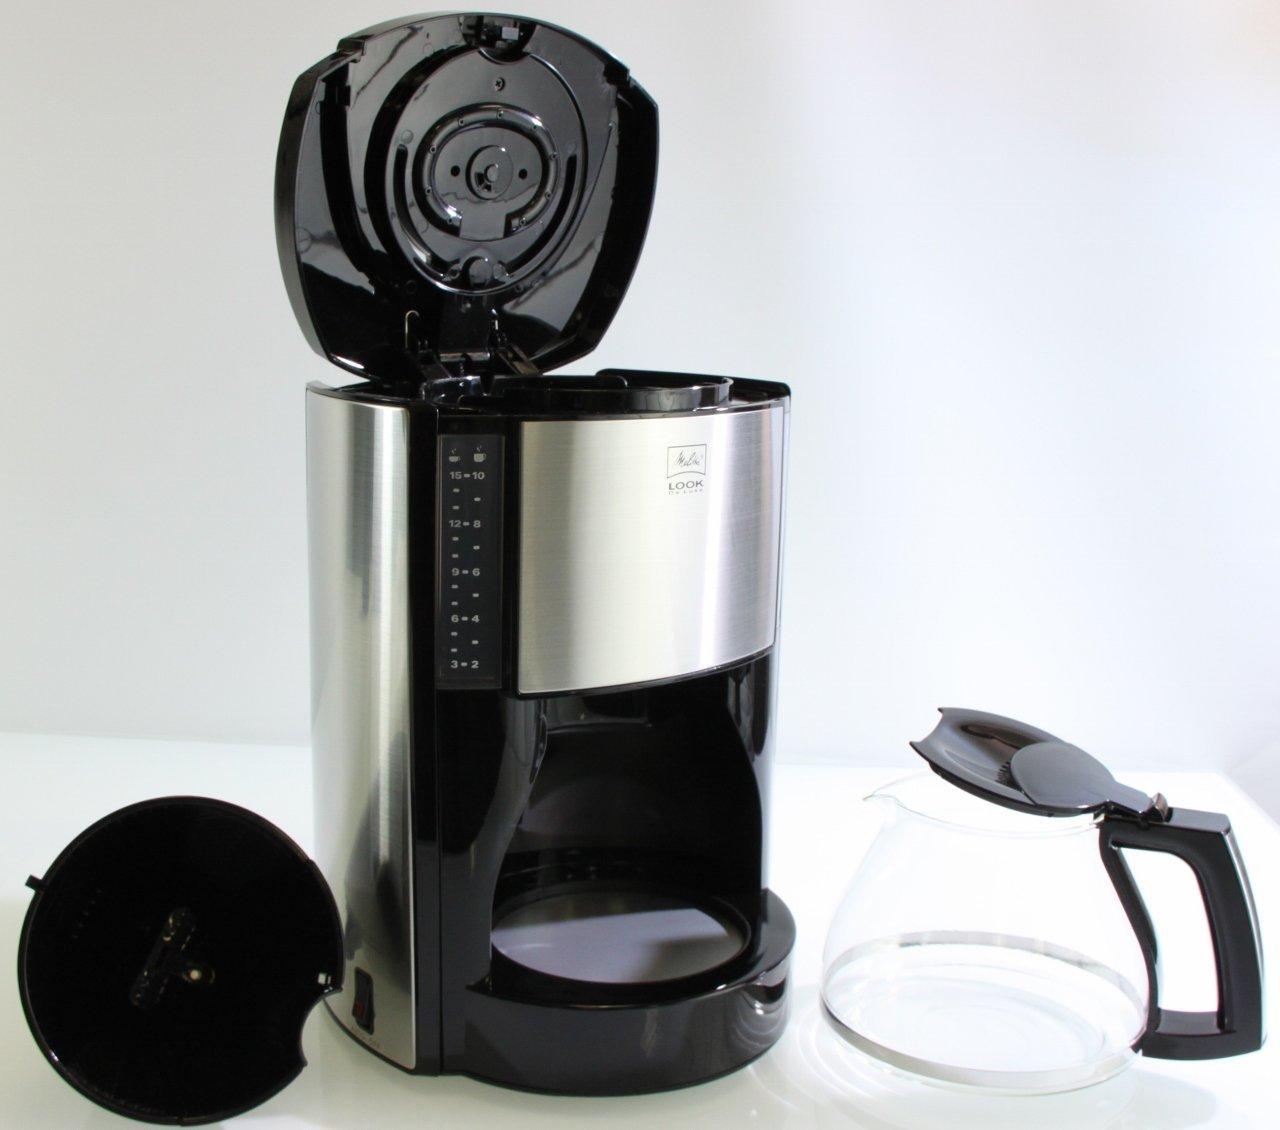 blitzangebot melitta look de luxe kaffeemaschine autom abschaltung tropfstopp schwarz. Black Bedroom Furniture Sets. Home Design Ideas